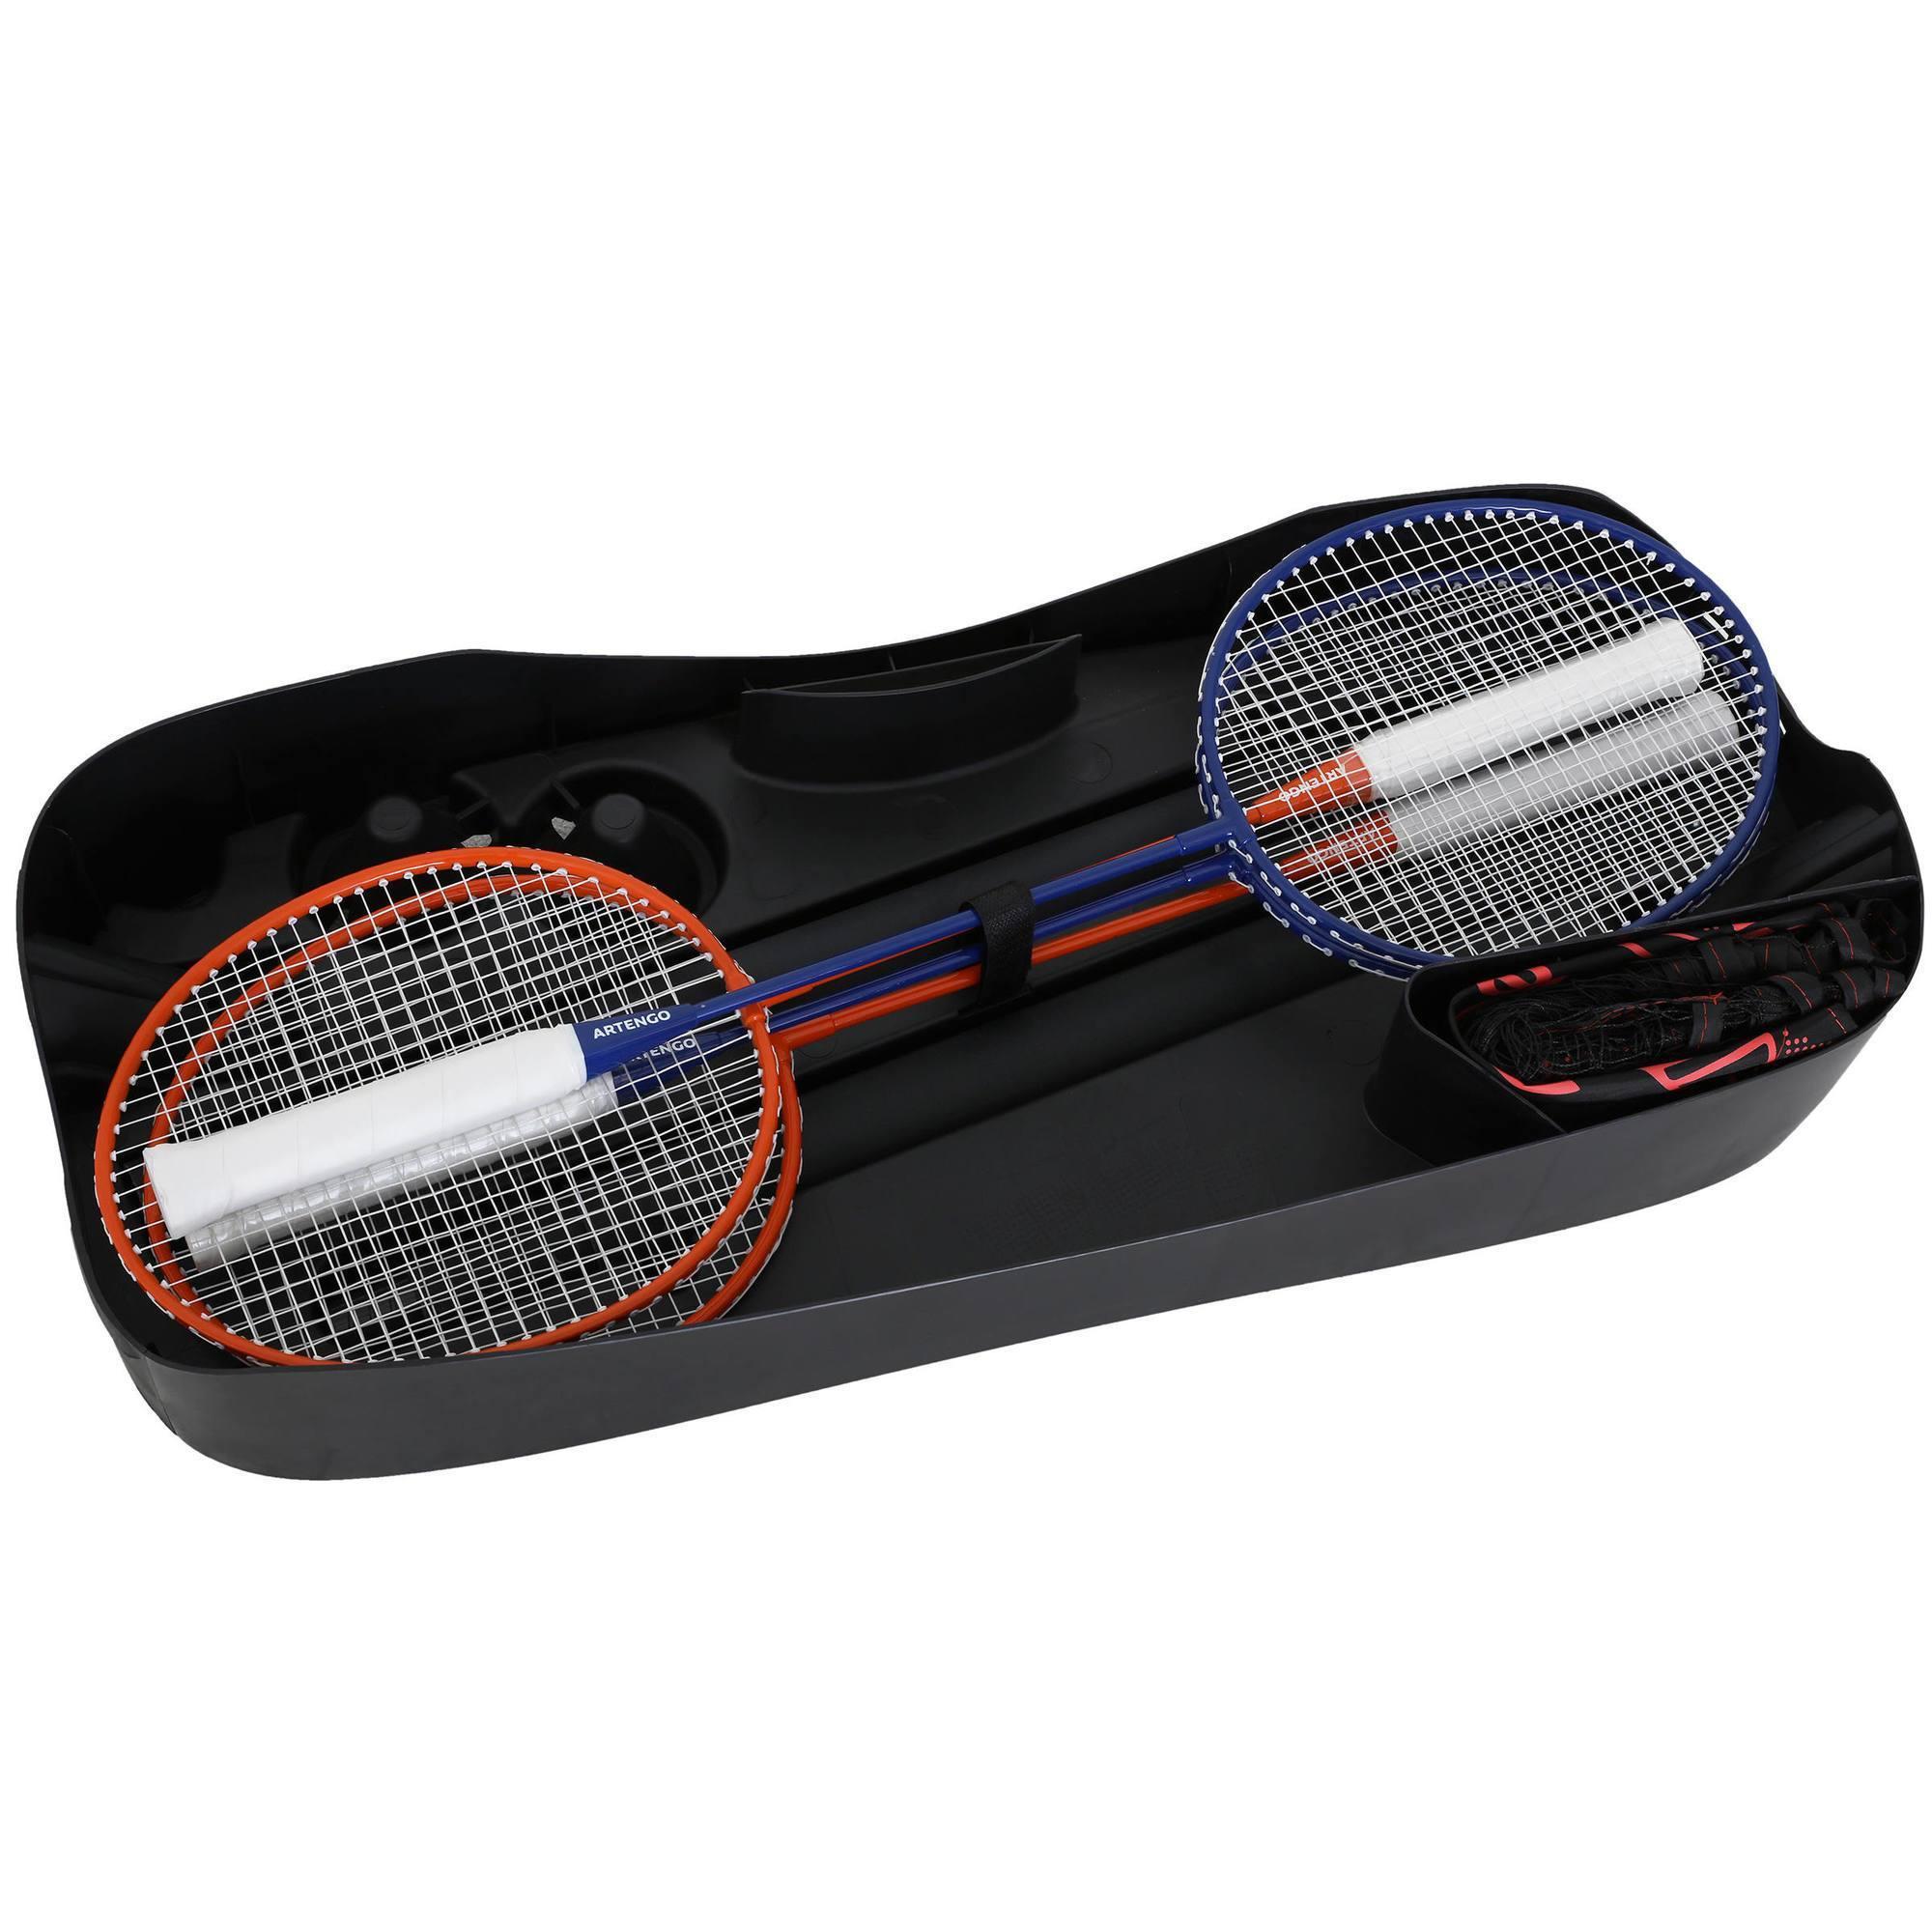 filet de badminton easy set 3m plus clubs. Black Bedroom Furniture Sets. Home Design Ideas